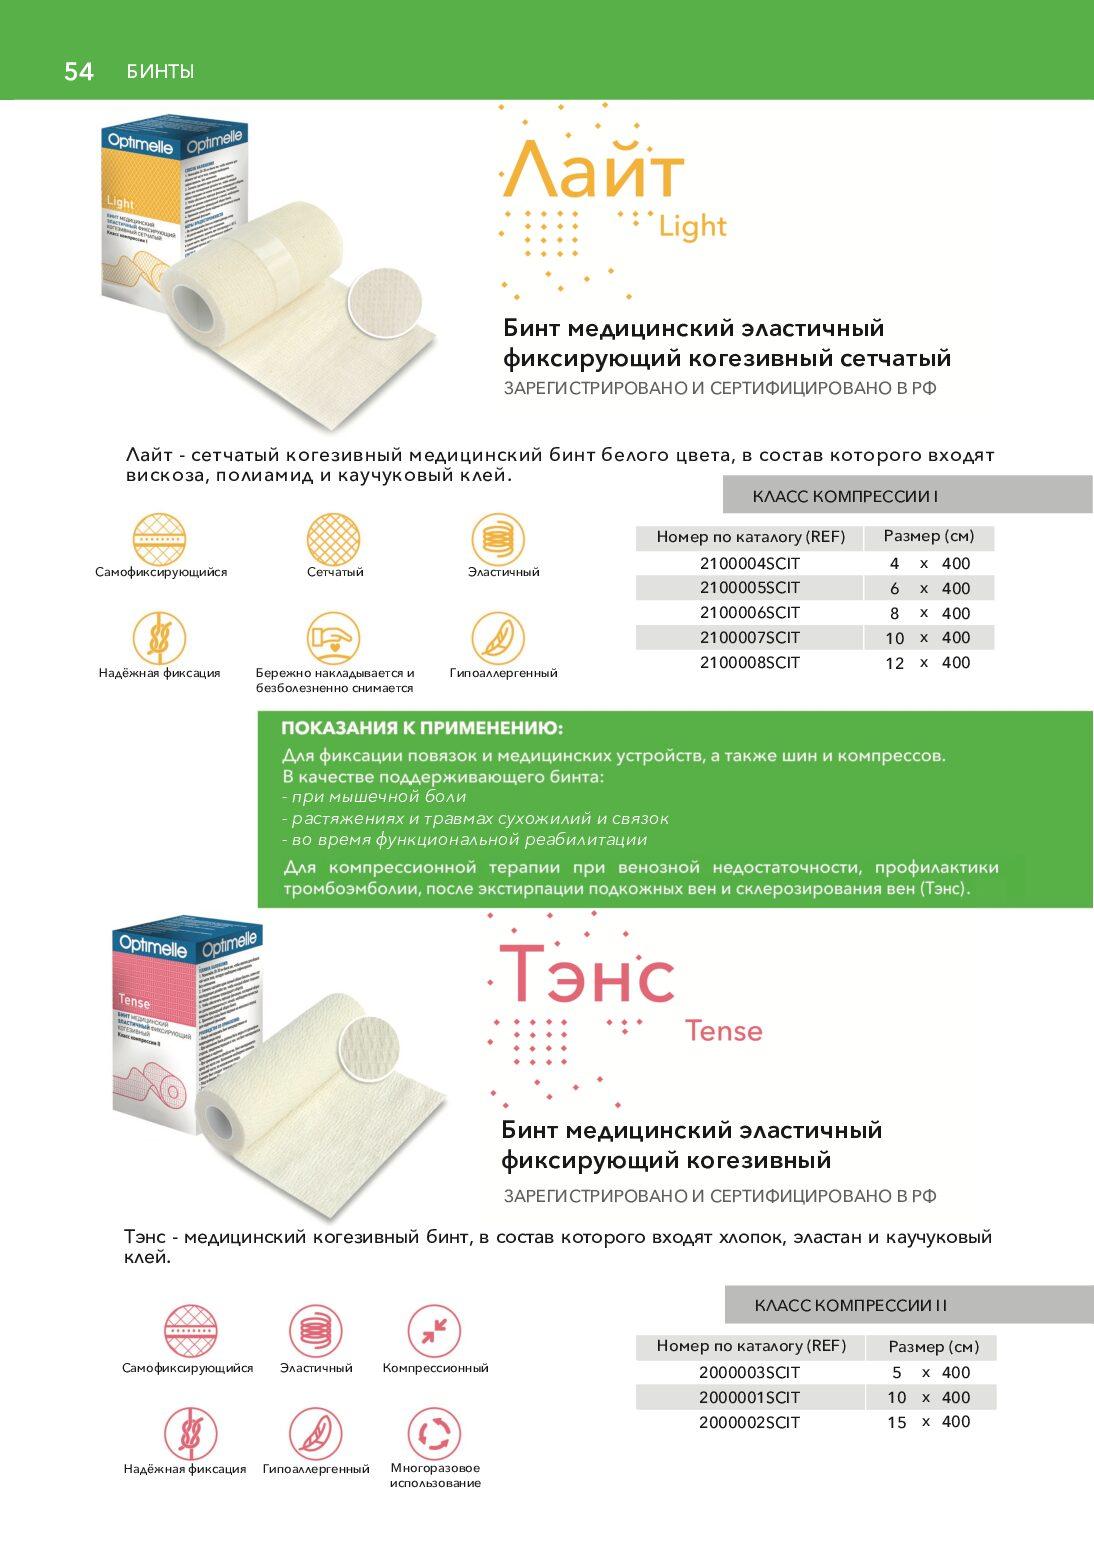 продукции Optimelle2 1 60 54 pdf